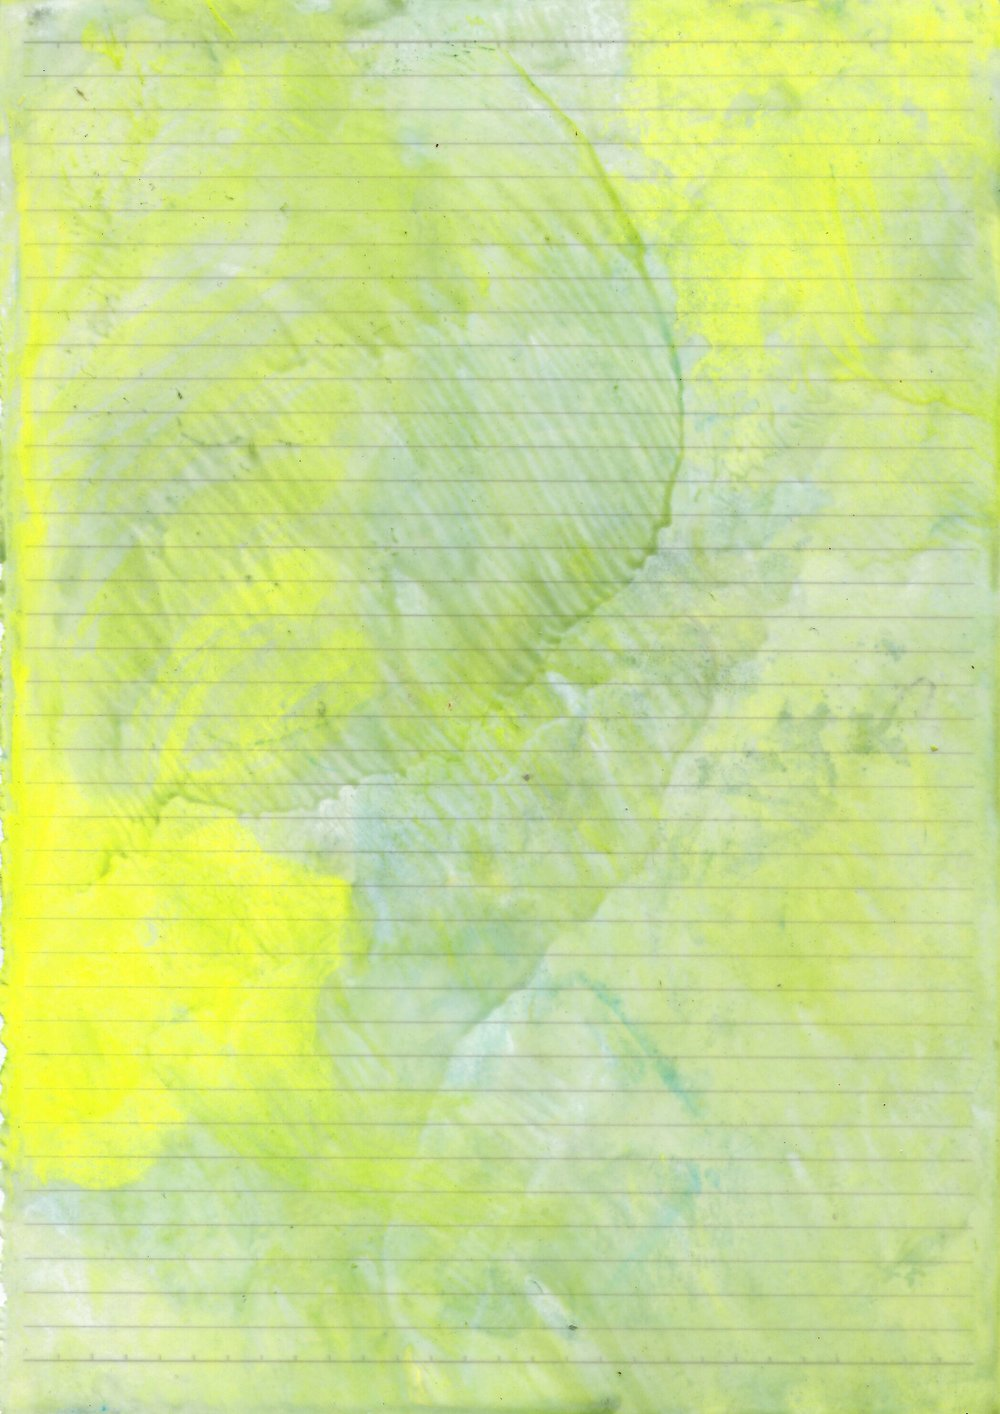 Always slipping away - Catalogue essay for Always Slipping Away by Liz Coats, Merryn Lloyd and Sophie QuinnImage: Merryn Lloyd